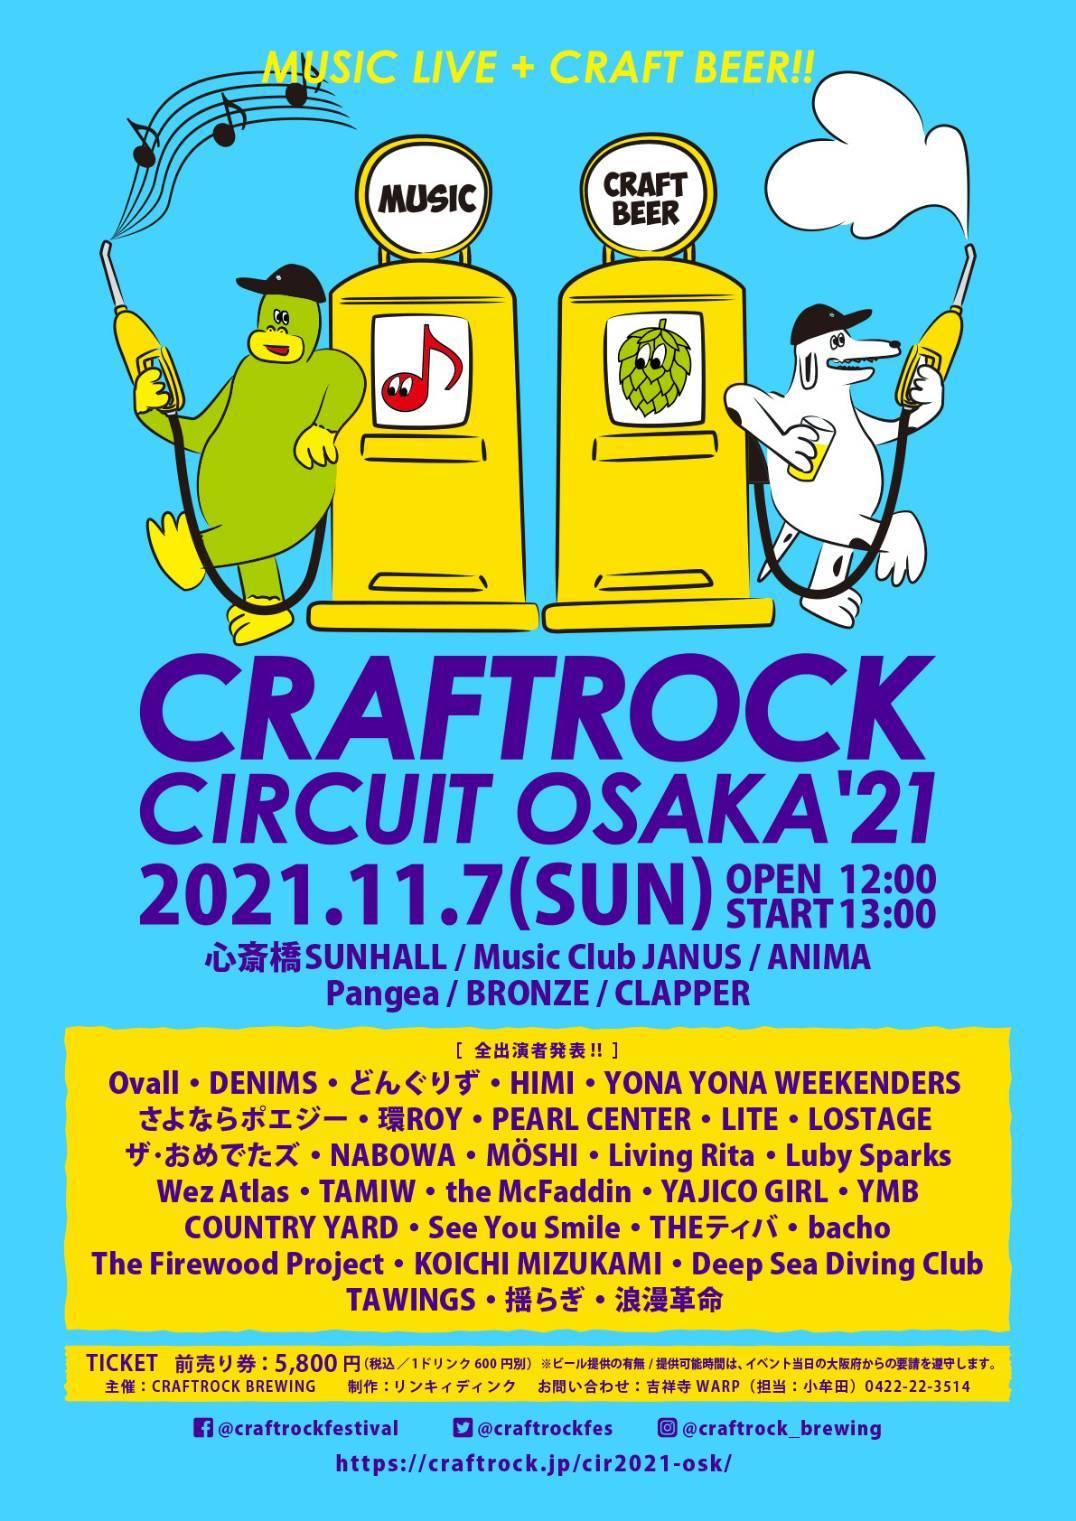 CRAFTROCK CIRCUIT OSAKA '21